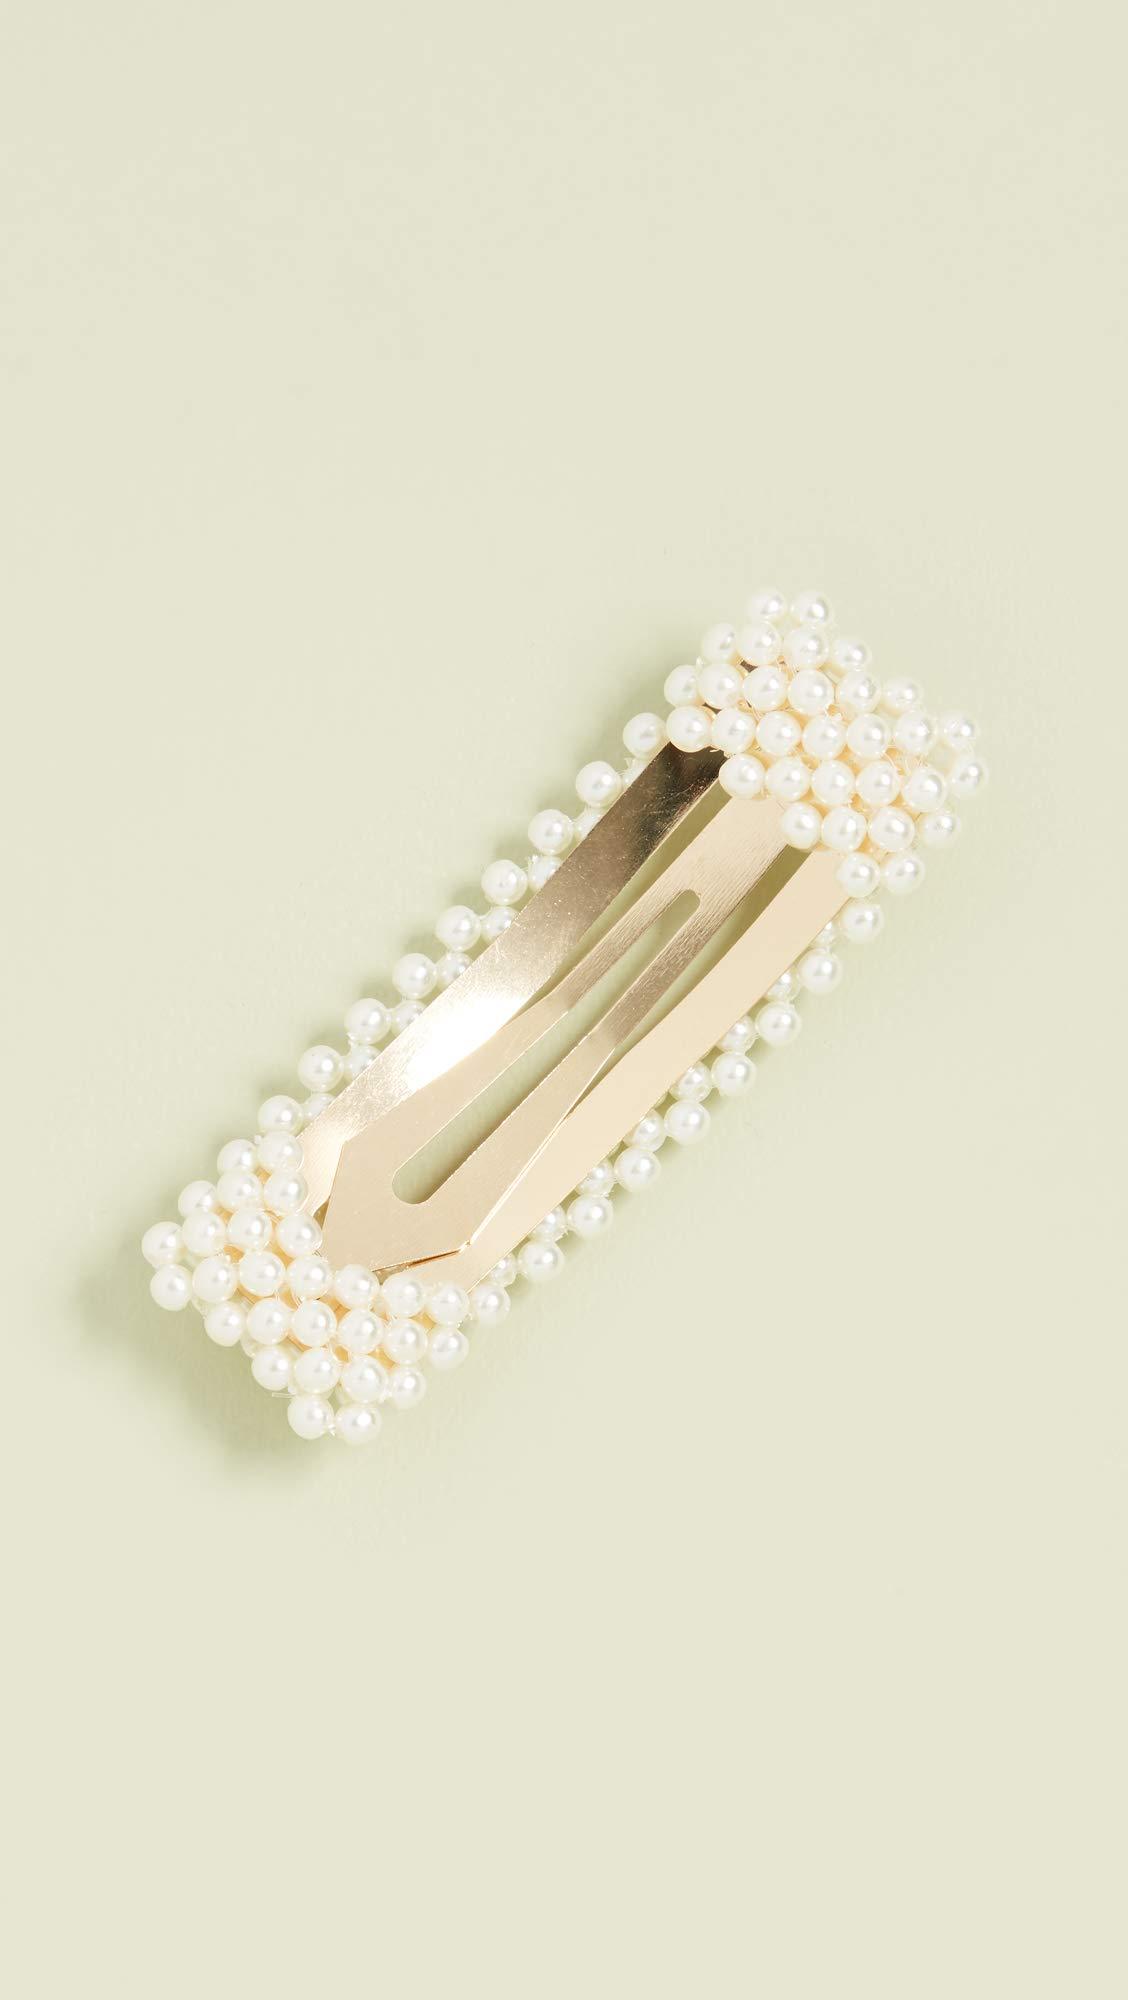 Jennifer Behr Women's Valerie Flip Clip, Pearl, Off White, One Size by Jennifer Behr (Image #4)